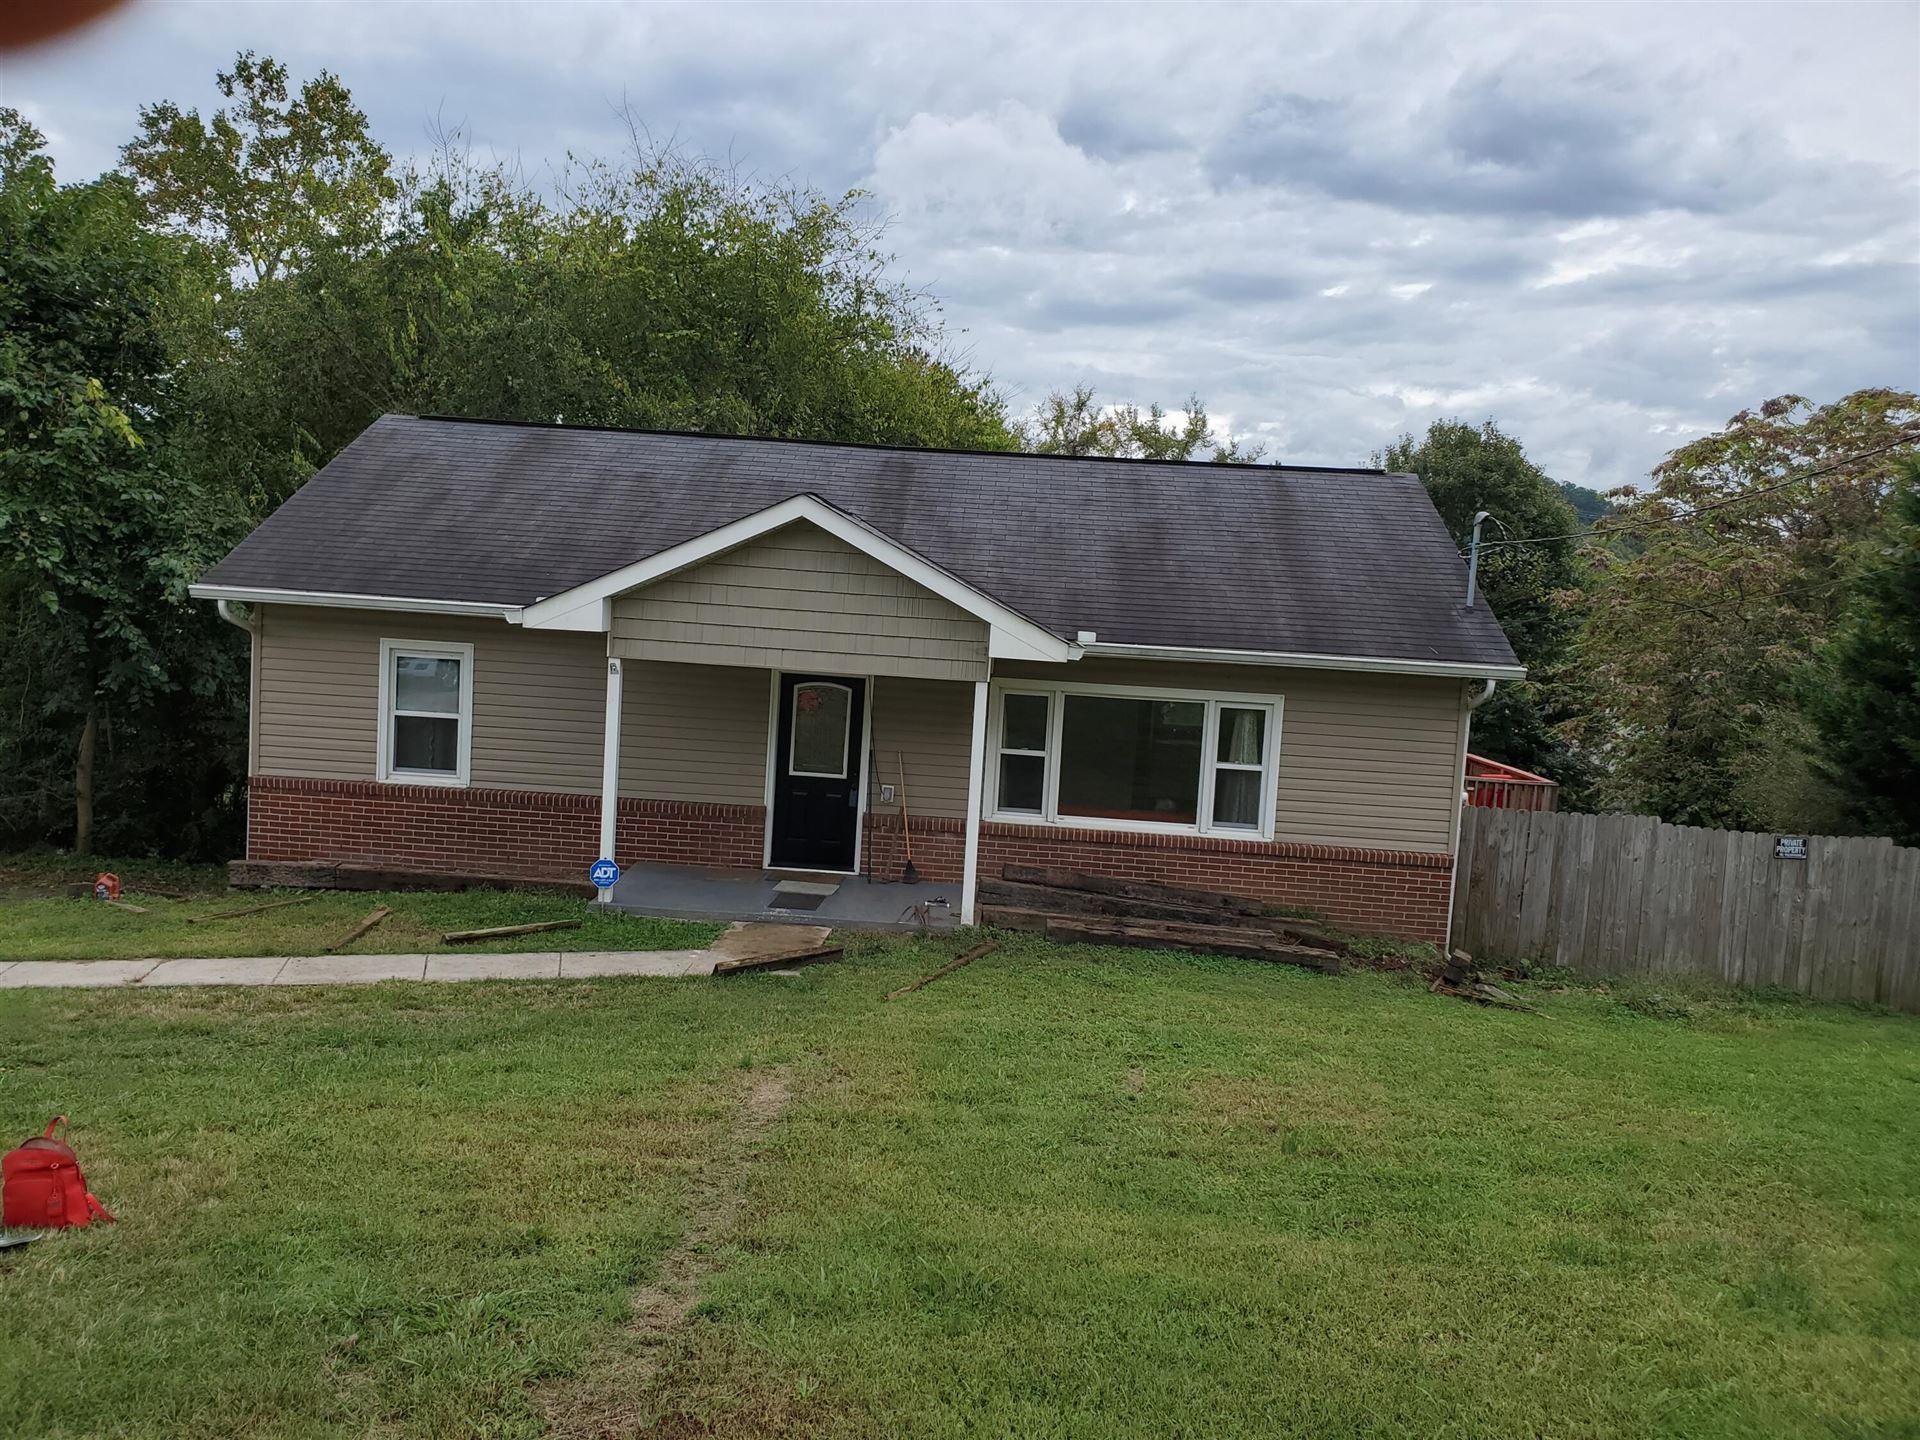 Photo of 117 Crest Lane, Clinton, TN 37716 (MLS # 1169684)